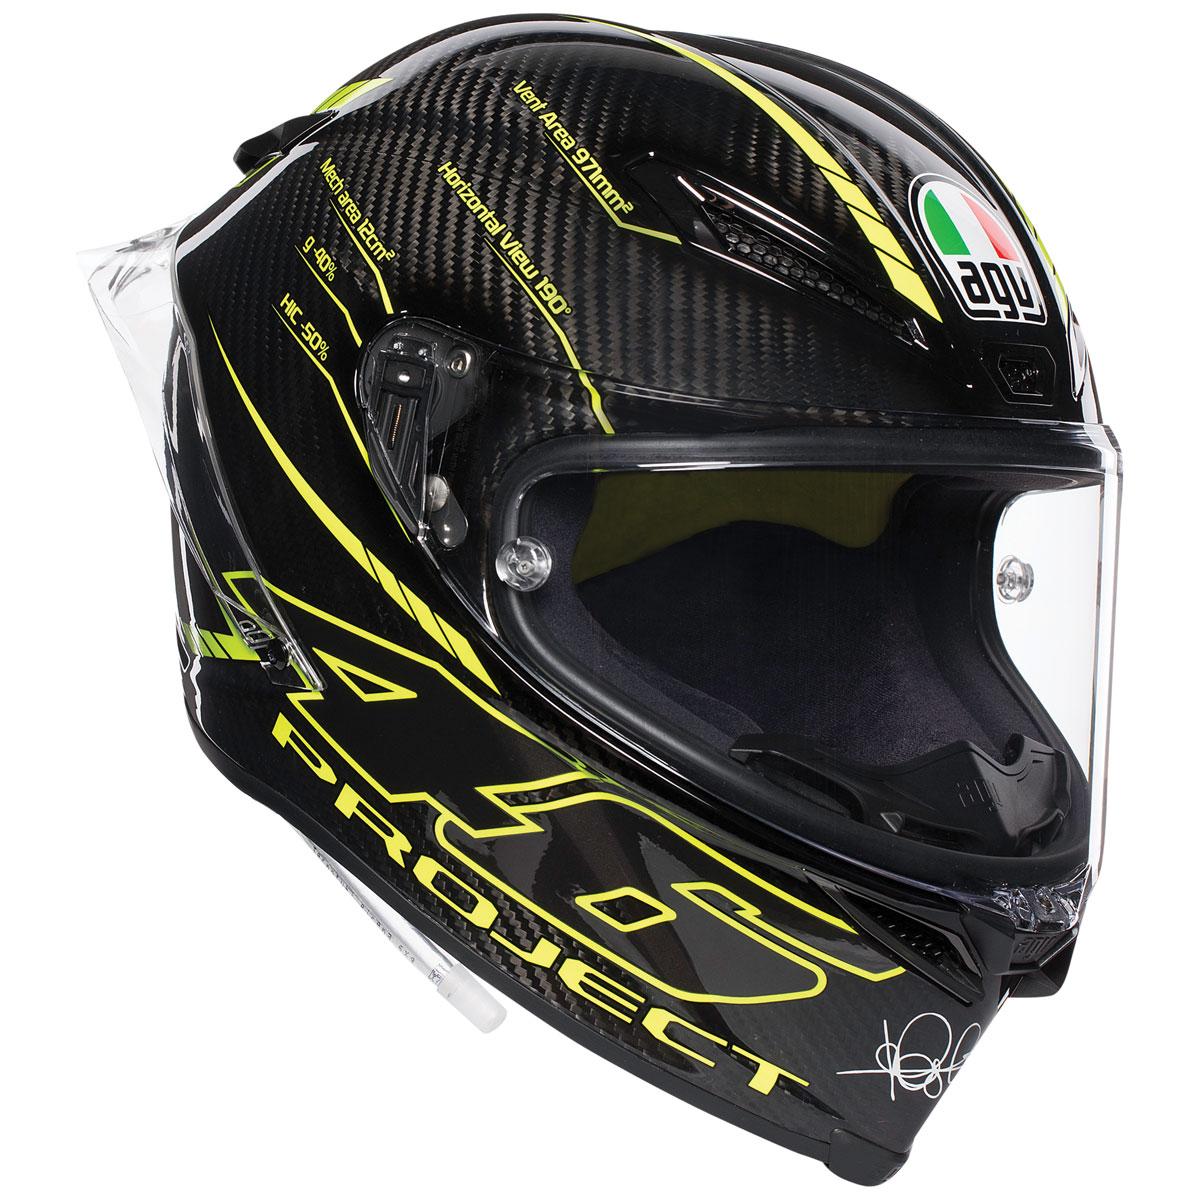 AGV Pista GP R Project 46 3.0 Carbon Full Face Helmet